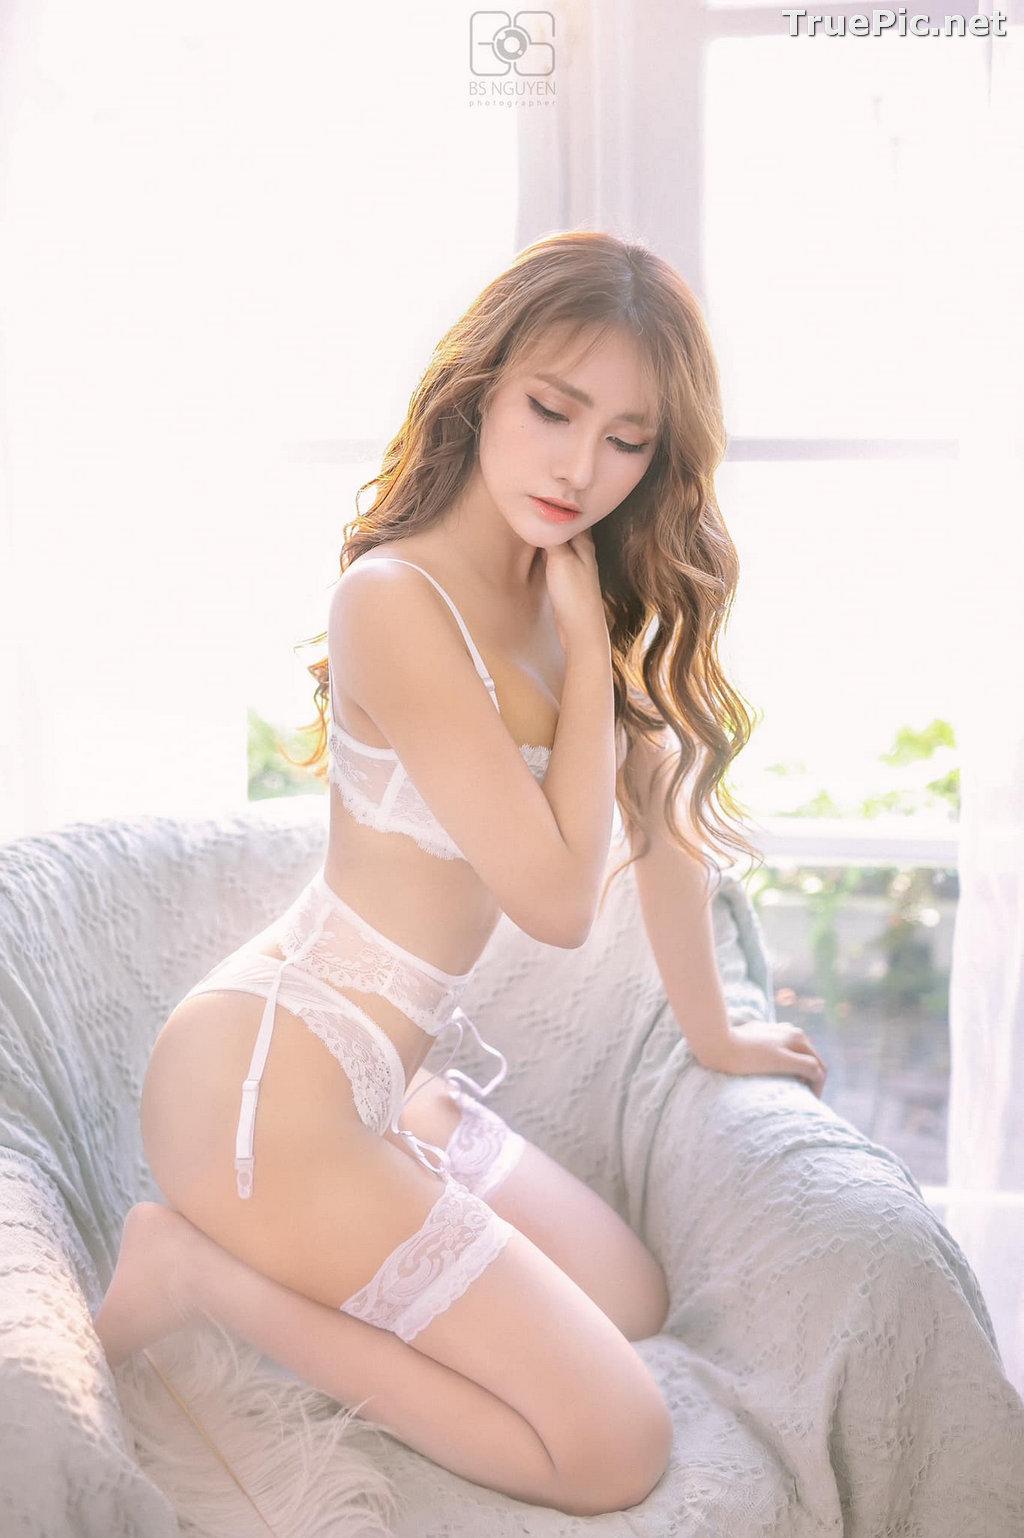 Image Vietnamese Model - Nguyen Thi Phi Yen - Beautiful Sexy White Lingerie - TruePic.net - Picture-25